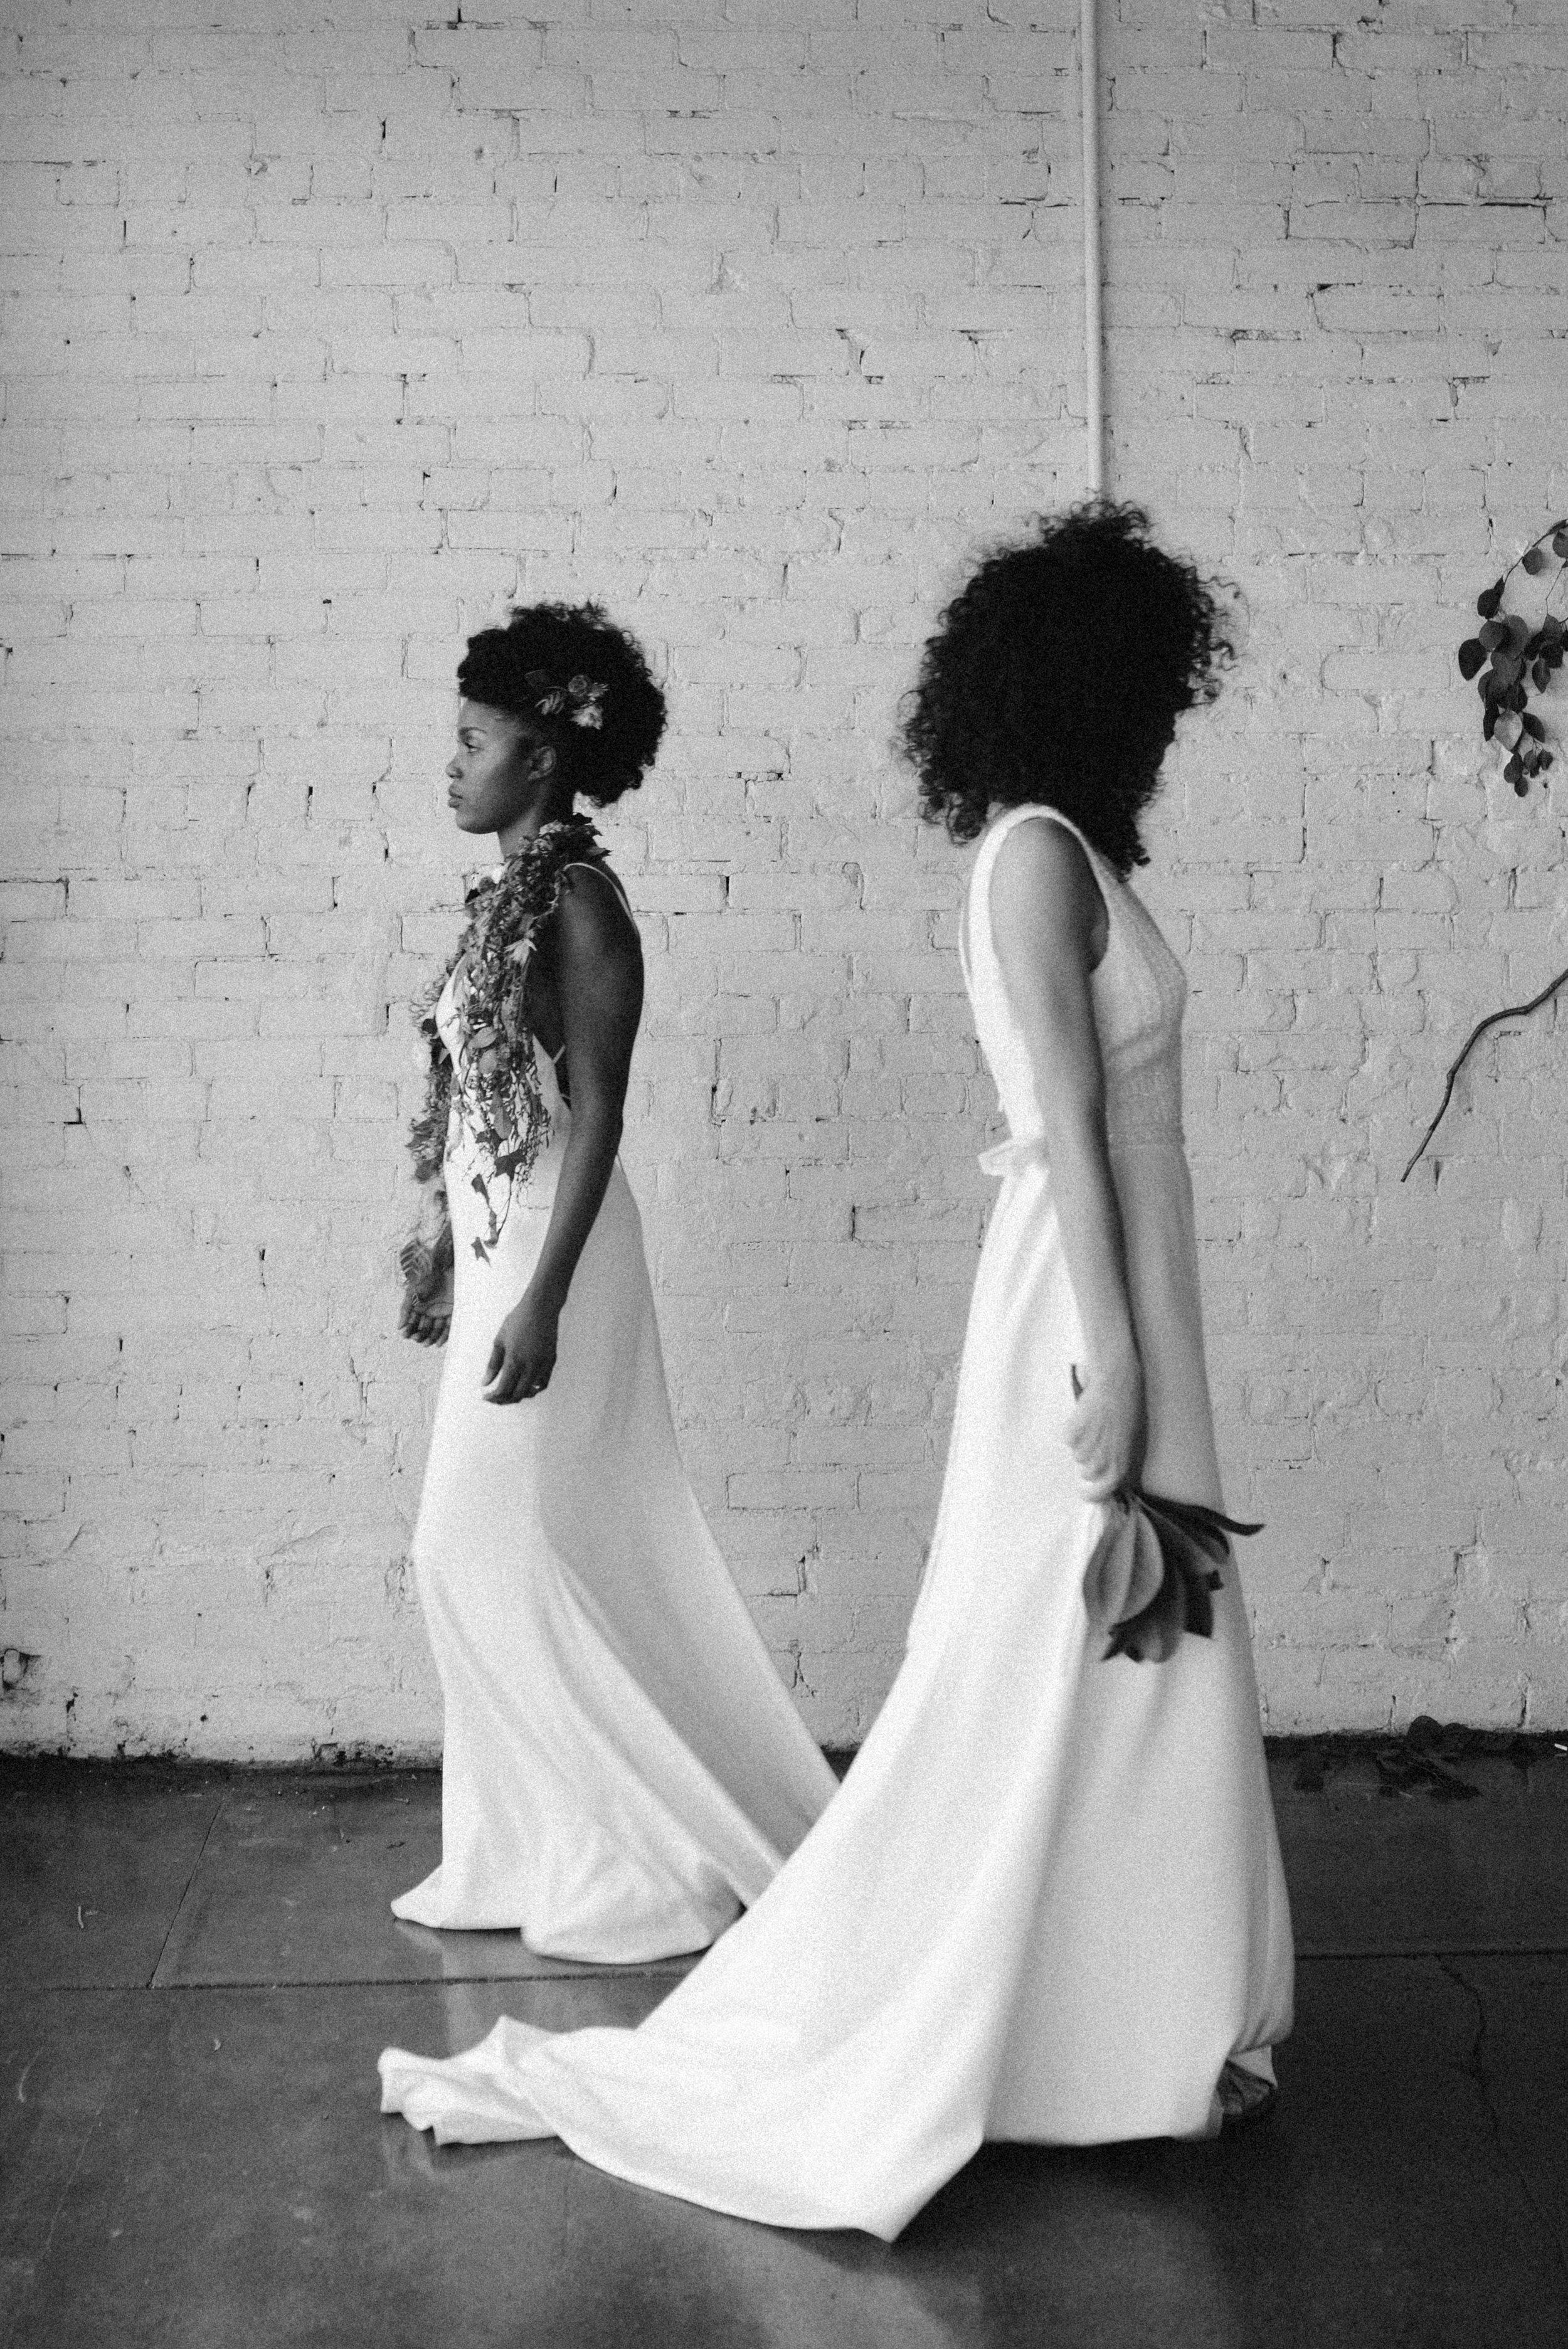 haus-820-minimal-editorial-wedding-styled-shoot-87.jpg